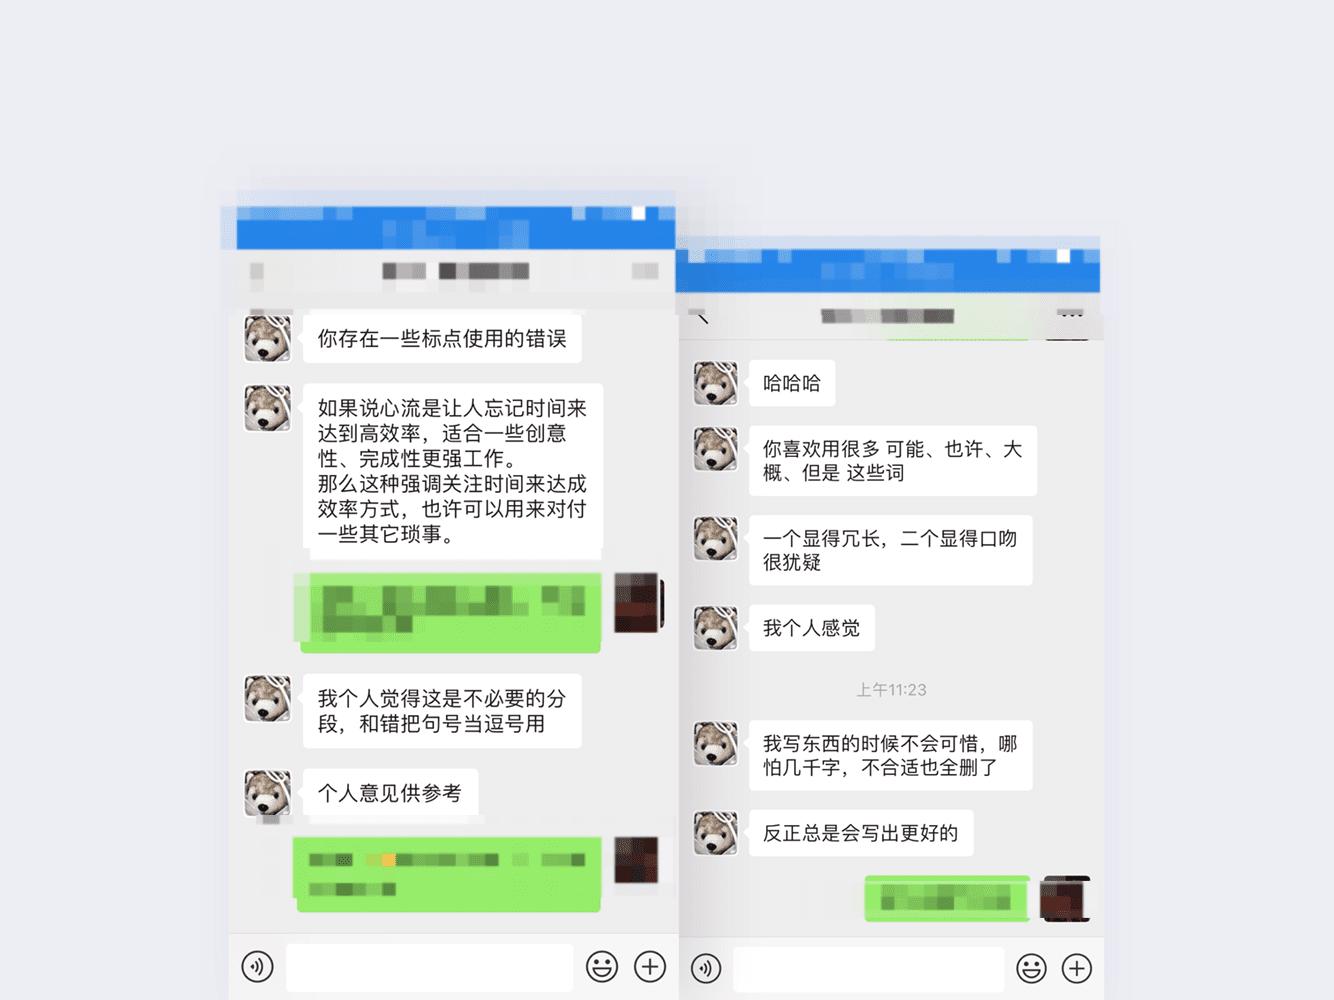 WechatIMG368.png-89.1kB